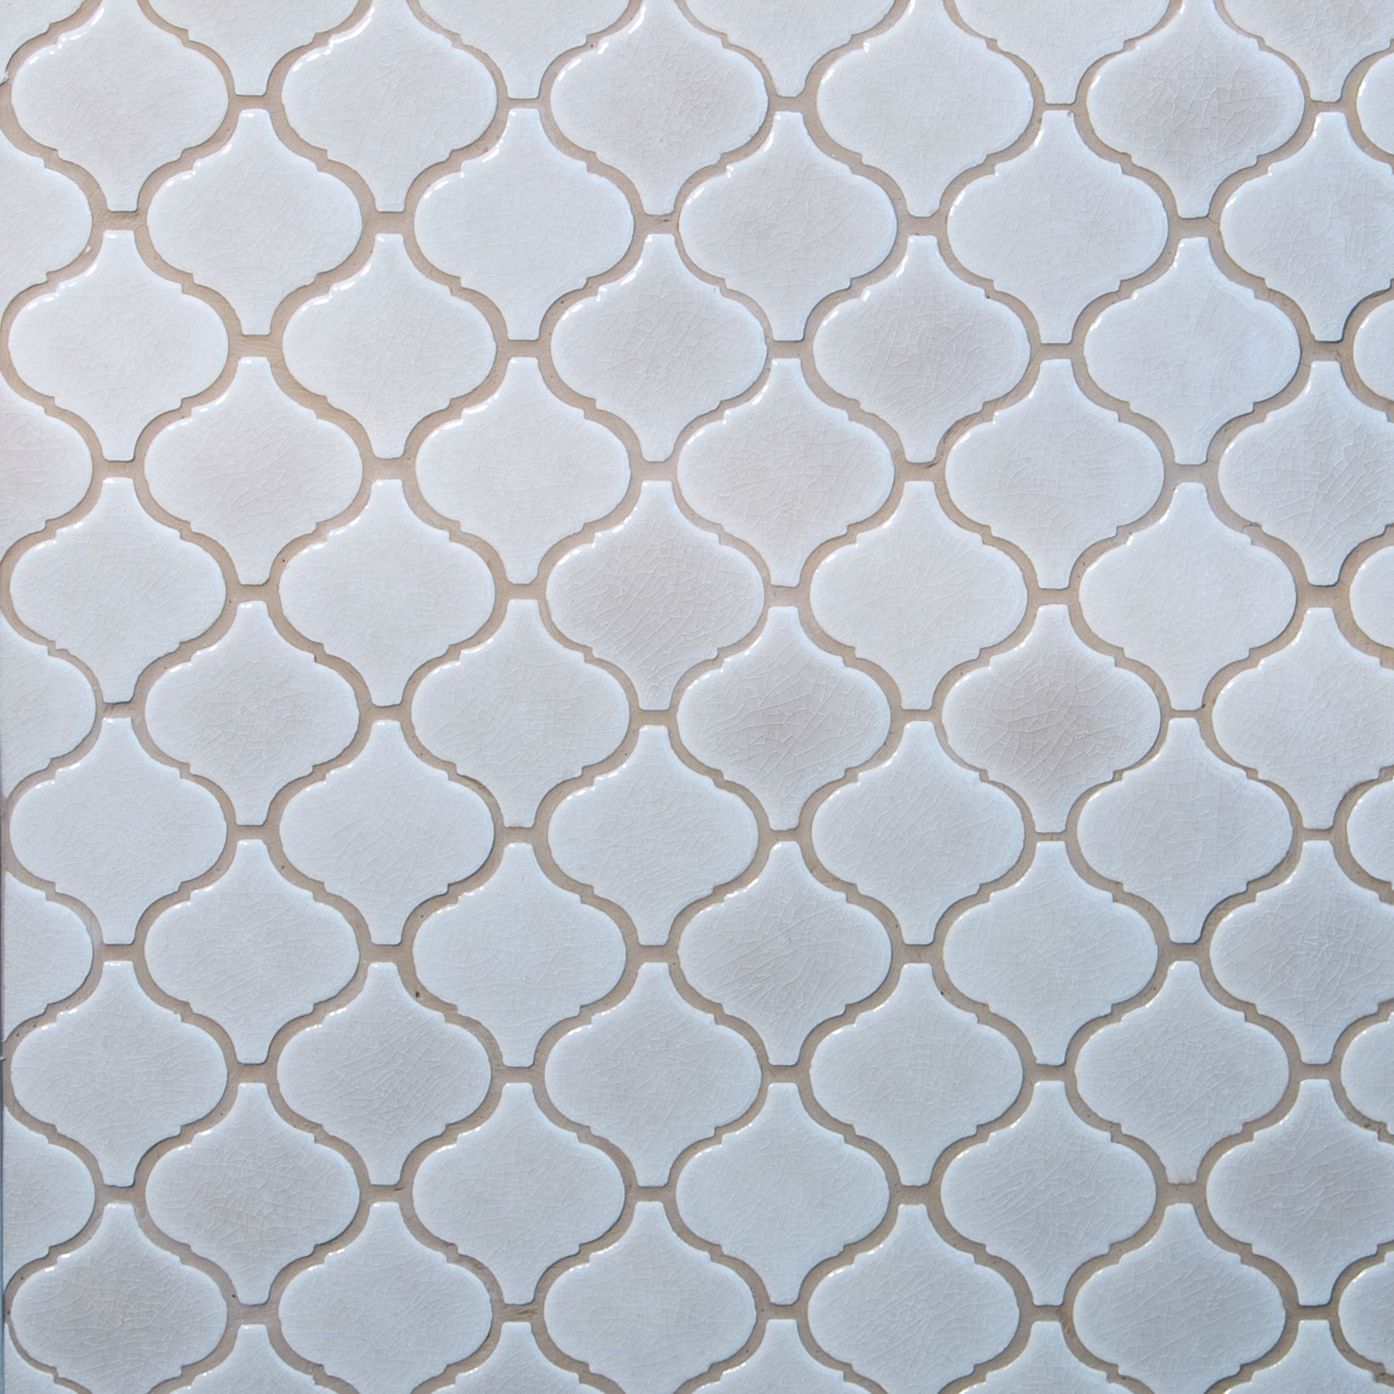 "White and Beige / 3""x3"" Arabesque Pattern Glass Mosaics 0"